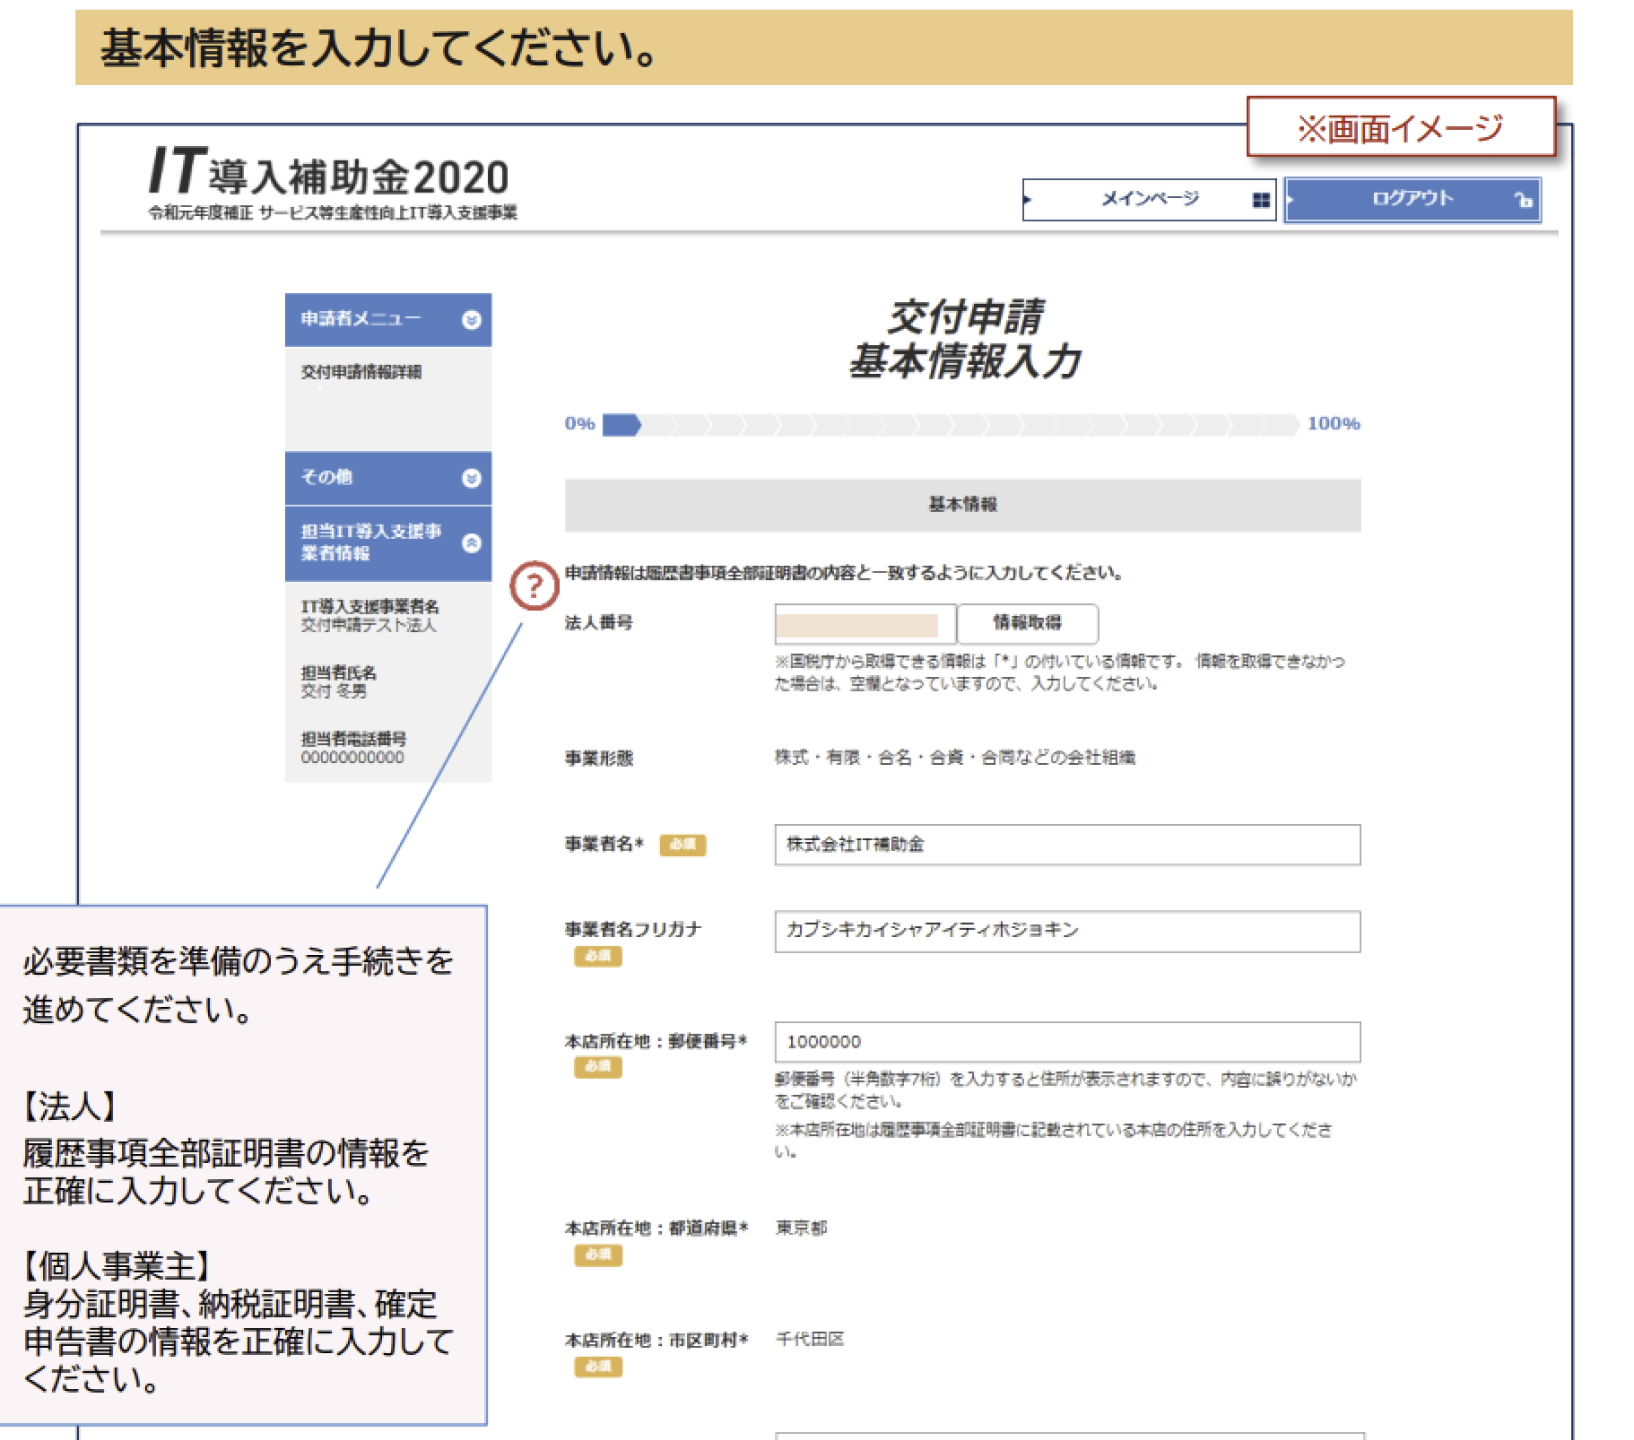 IT導入補助金基本情報作成のスクリーンショット